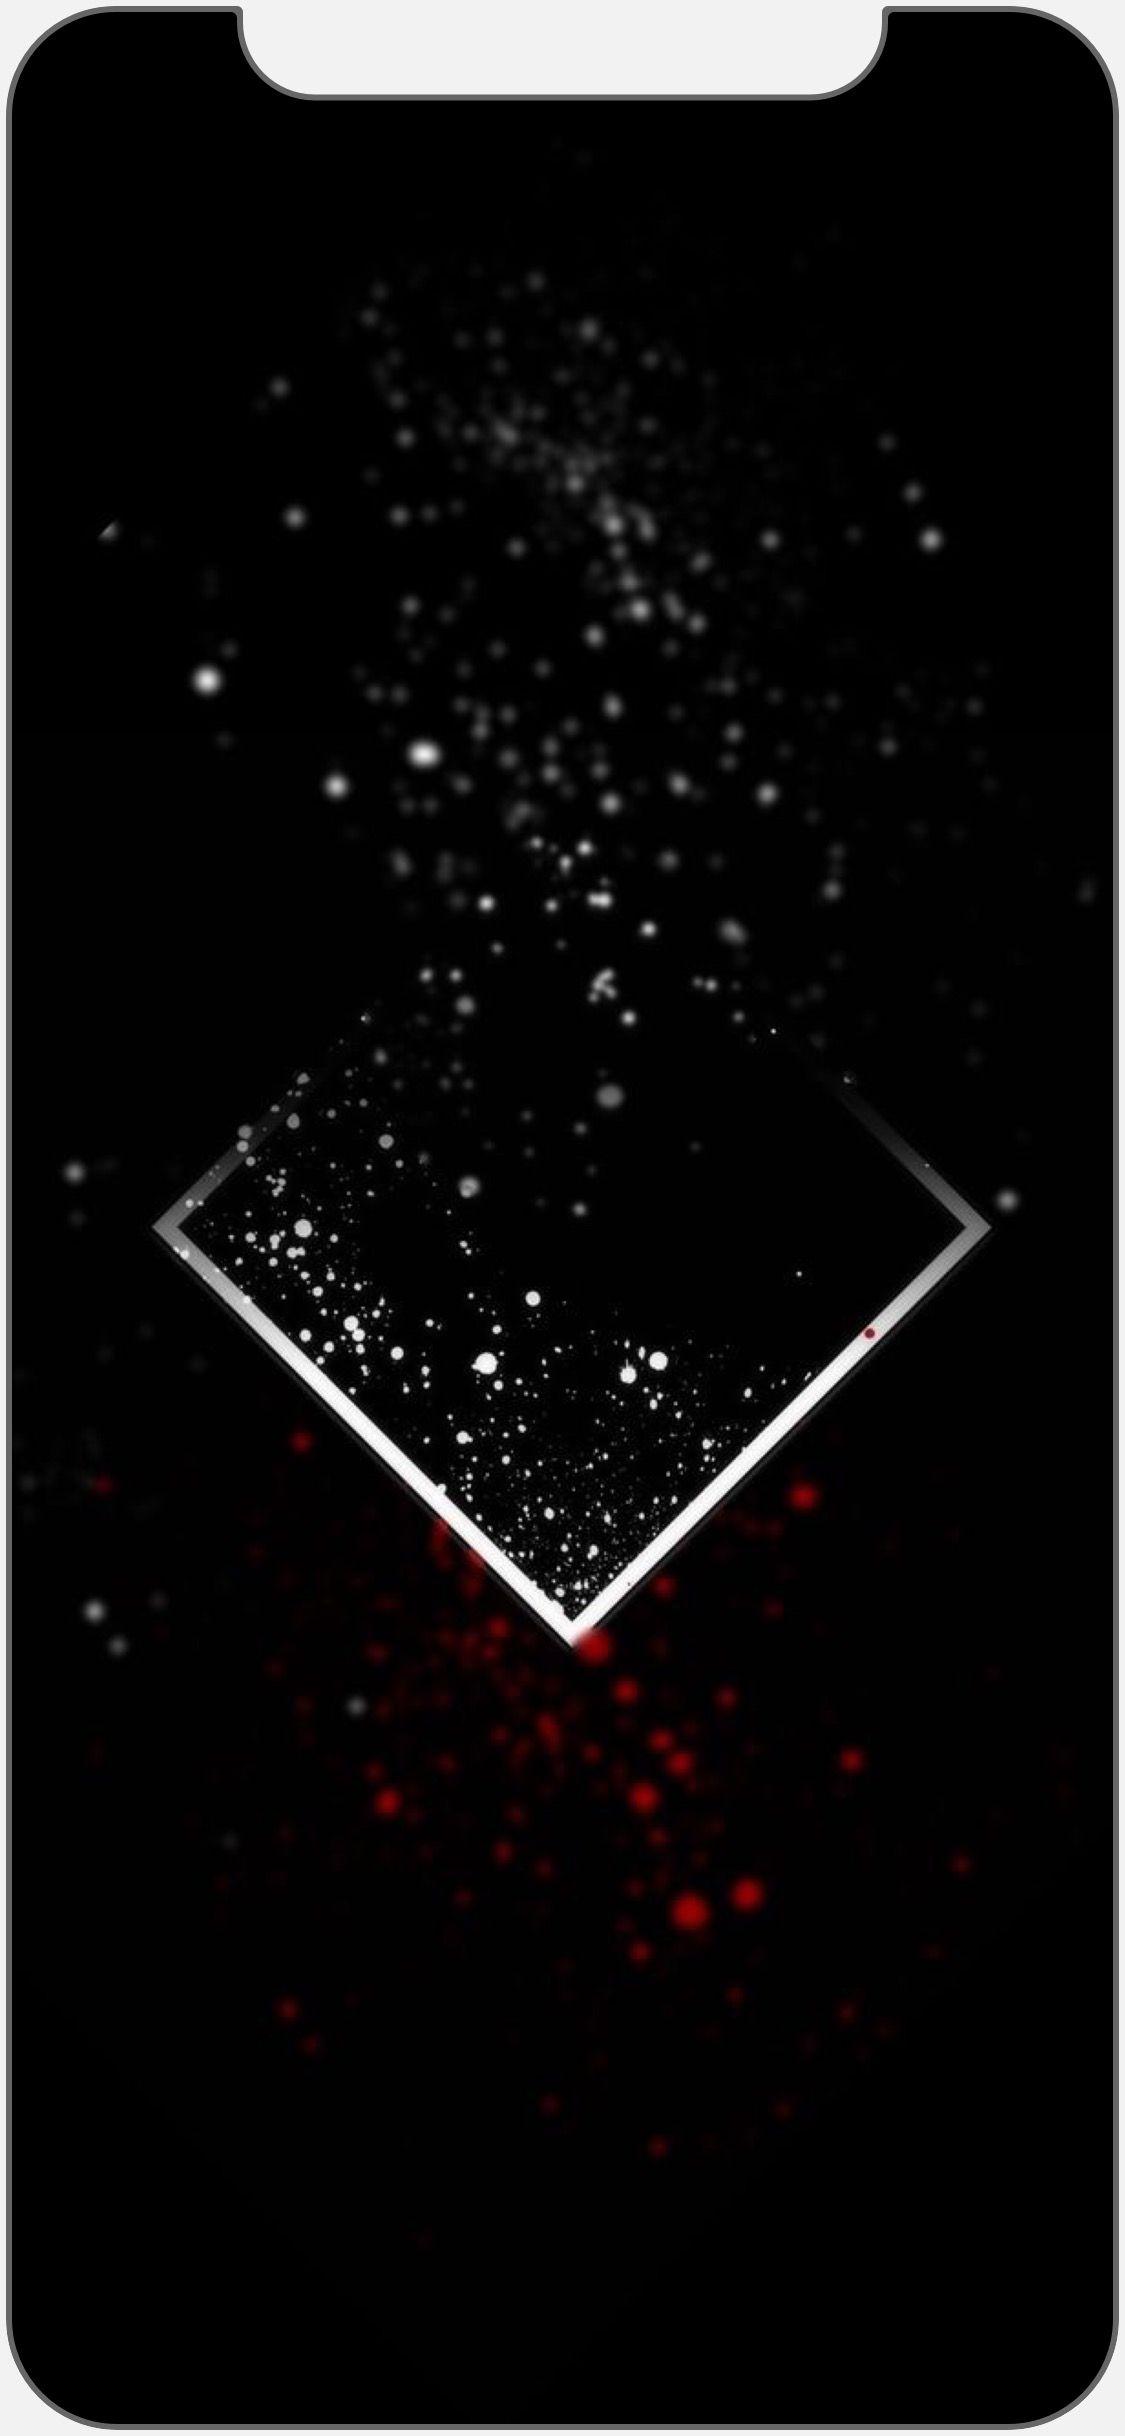 Pin by Deon Van Der Merwe on iphone x wallpaper (With